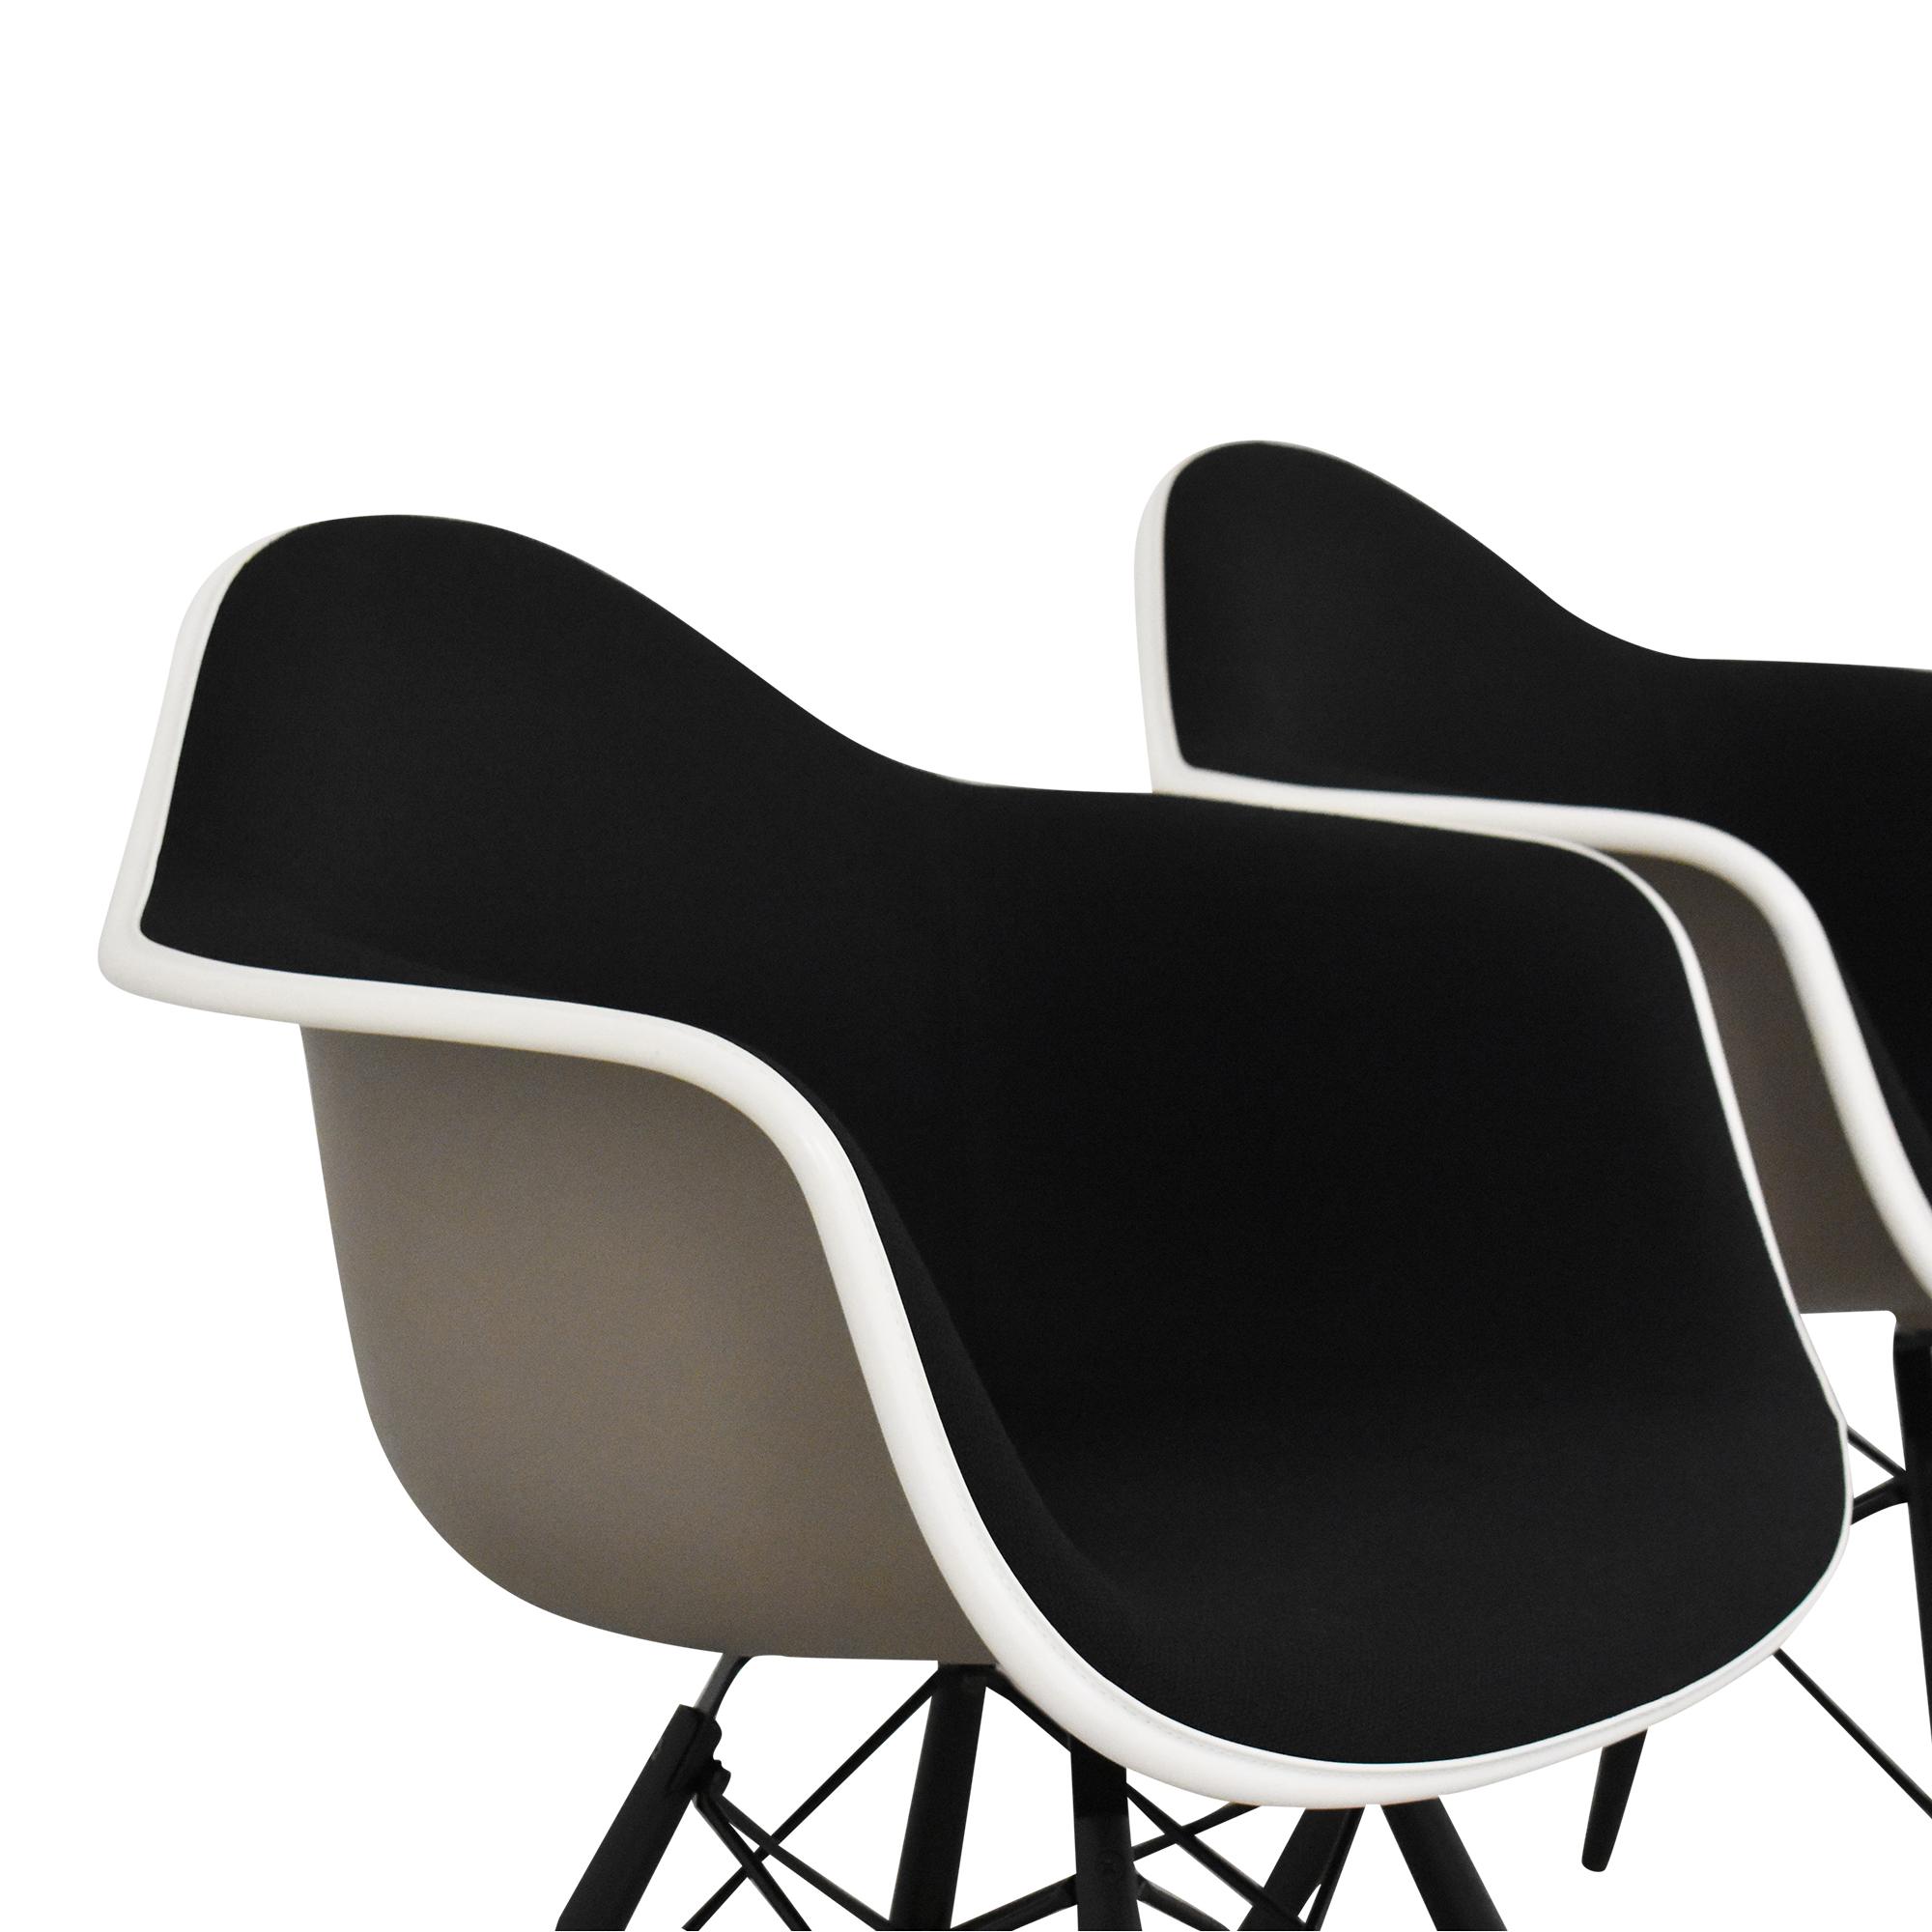 Herman Miller Herman Miller Eames Molded Arm Chairs ct